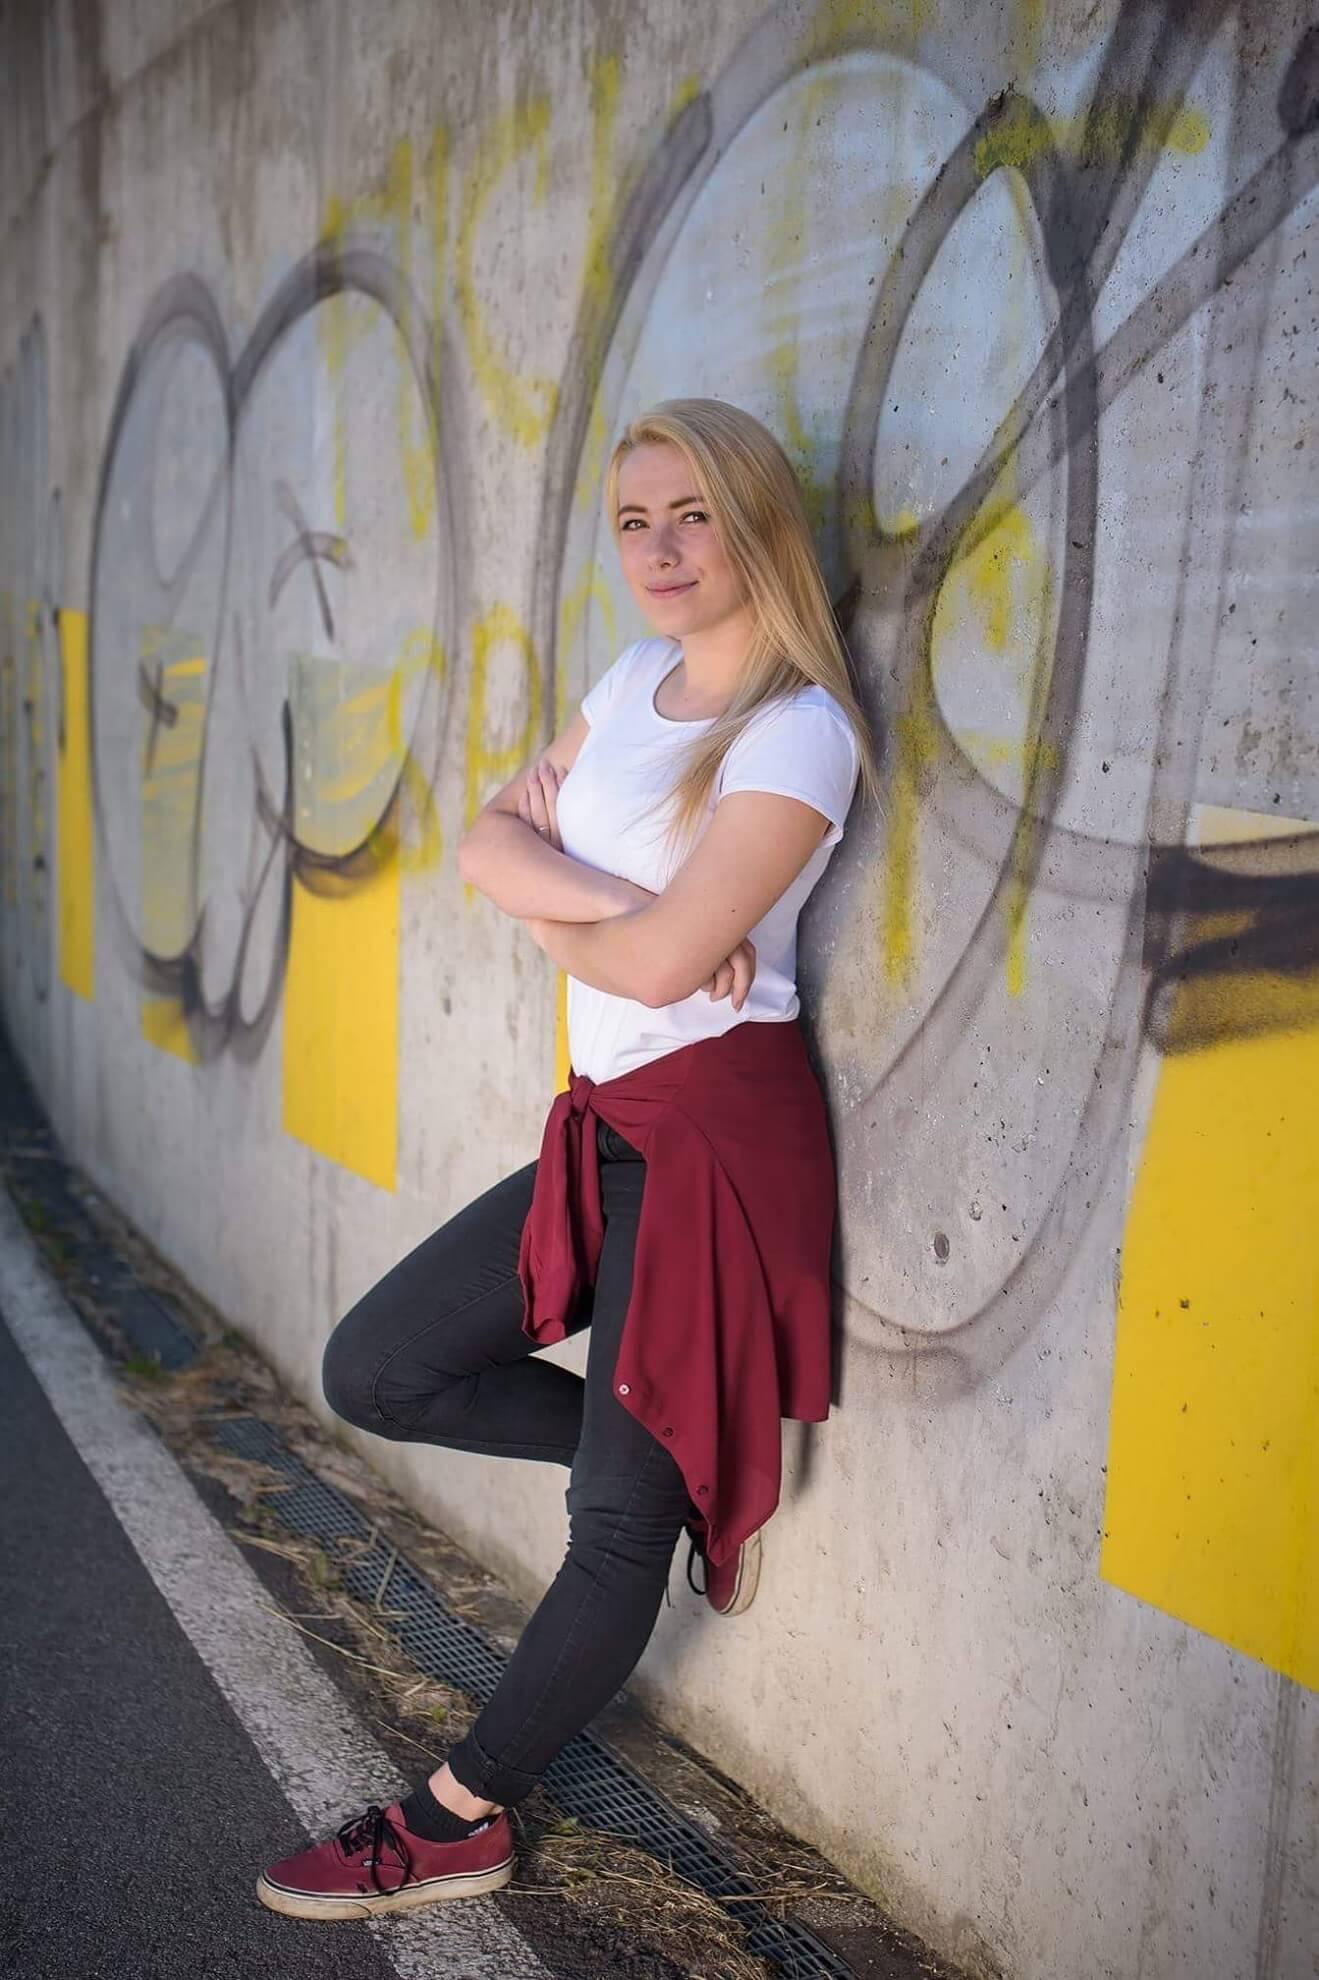 Illona-Salkova-move21-praha-tanecni-studio (1)